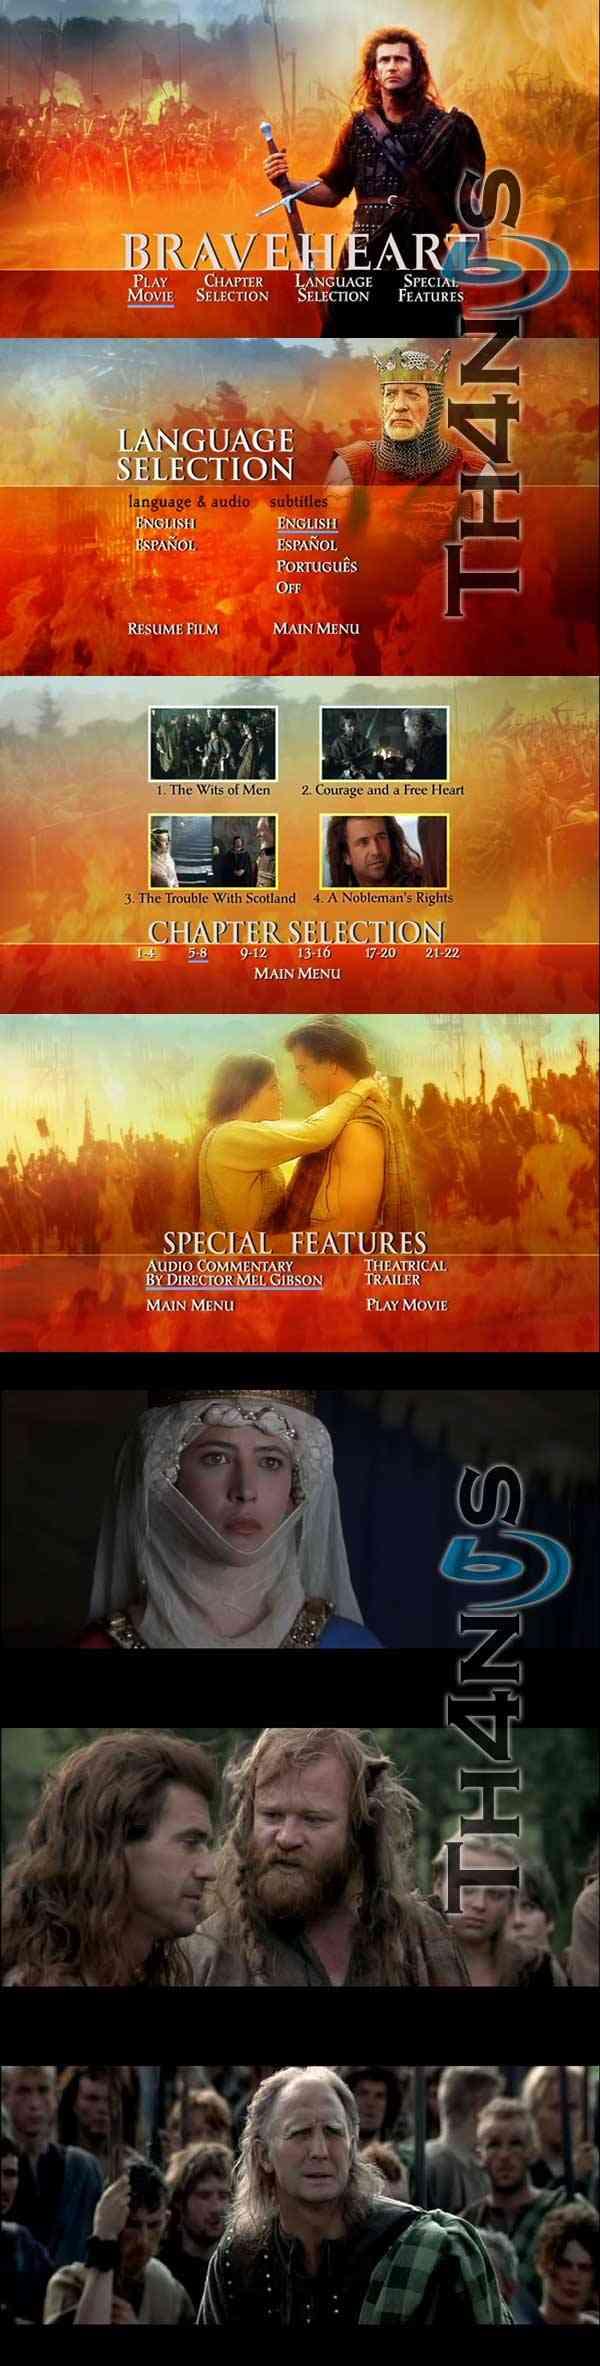 valiente dvd full latino dating